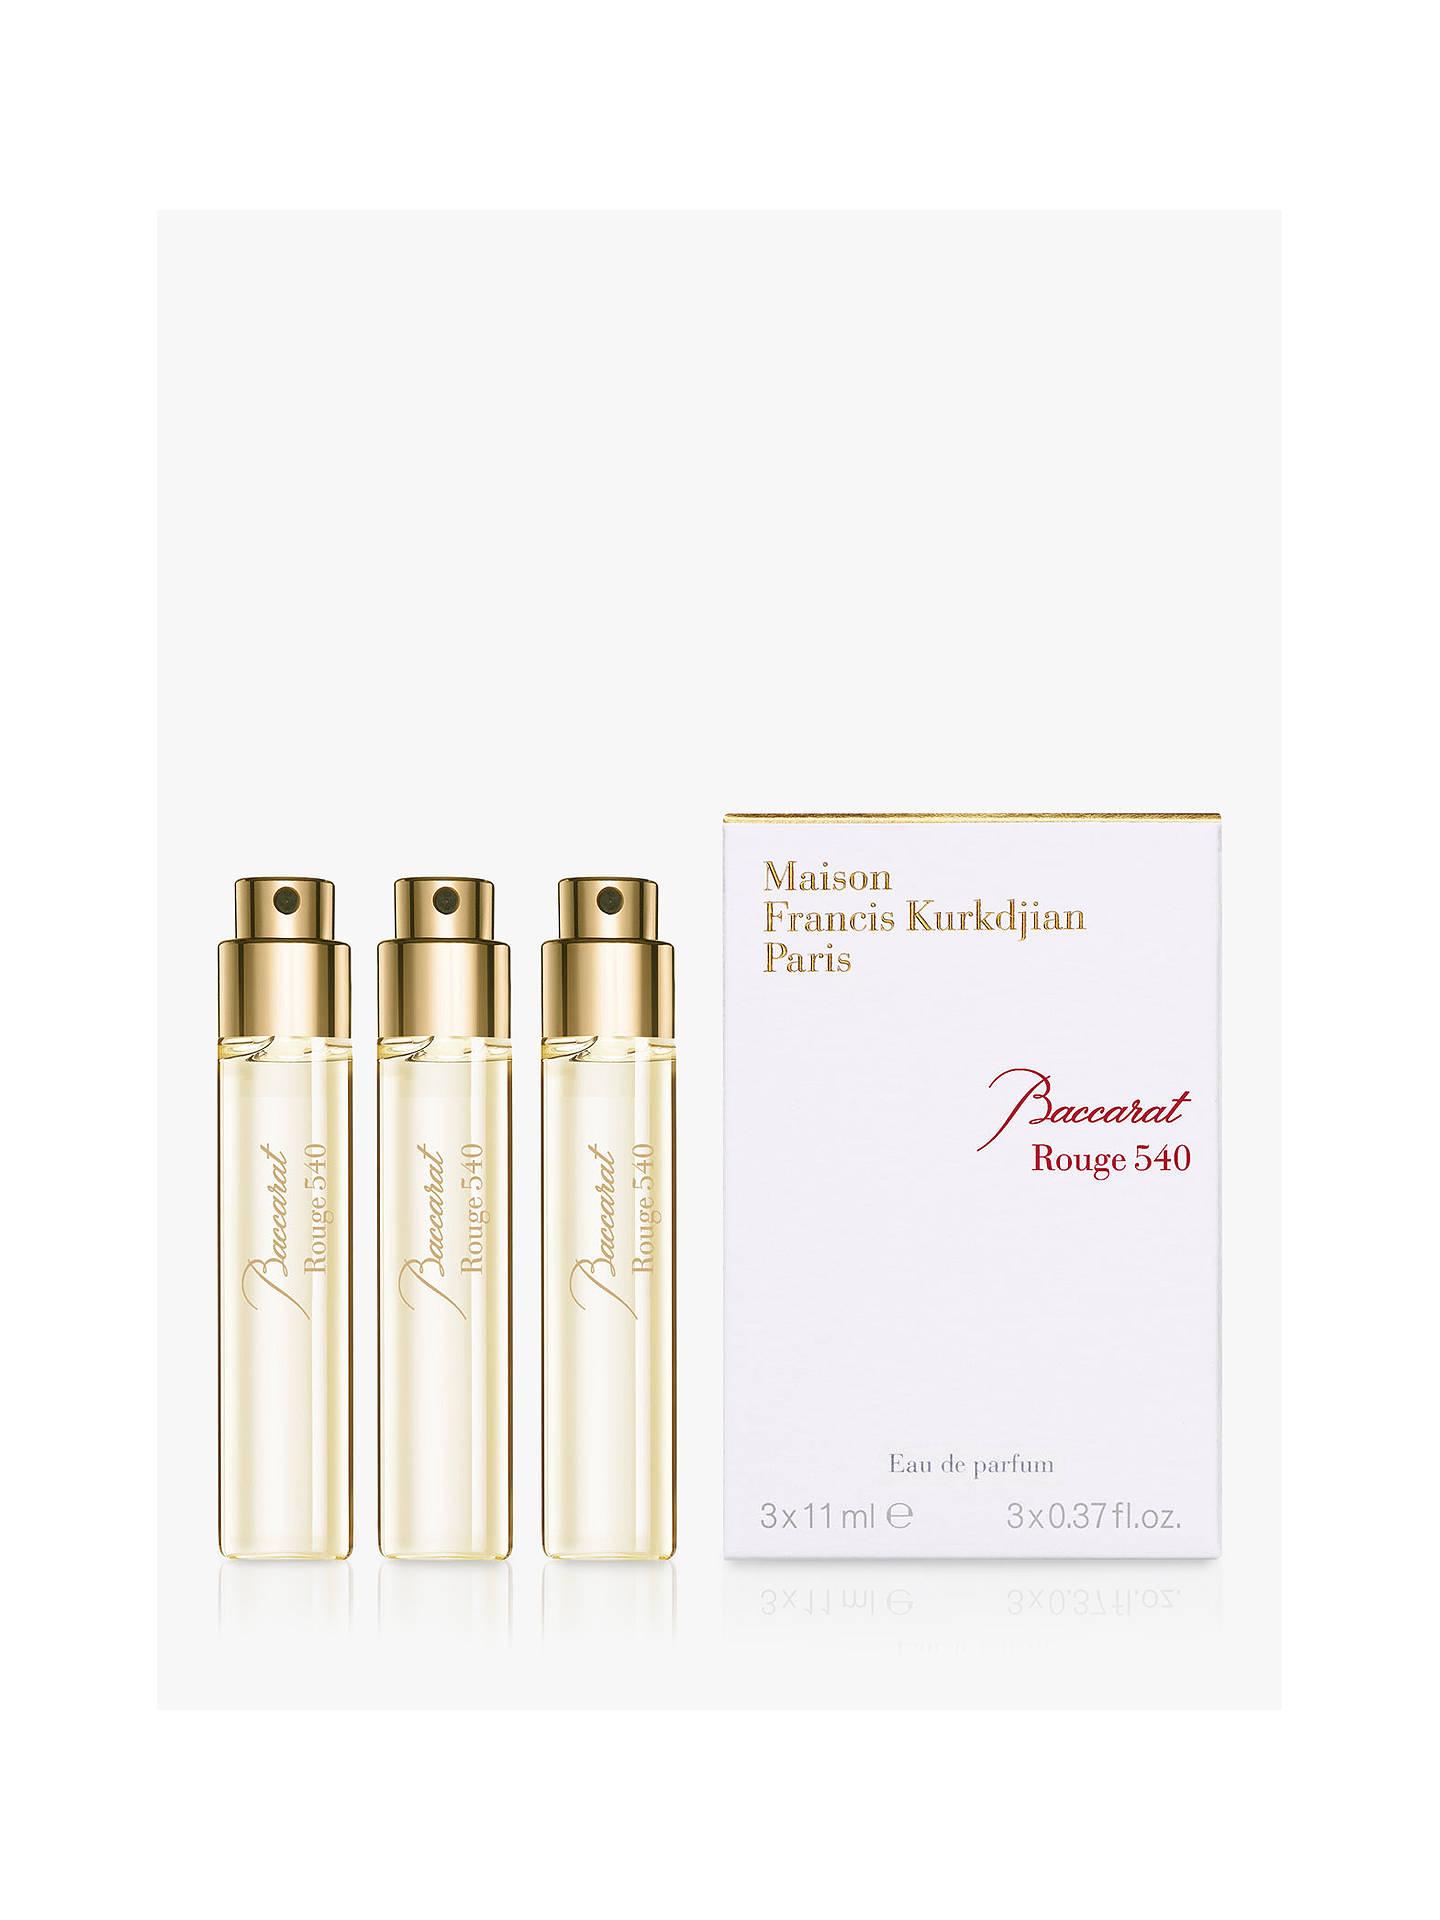 Maison Francis Kurkdjian Baccarat Rouge 540 Eau De Parfum Refills 3